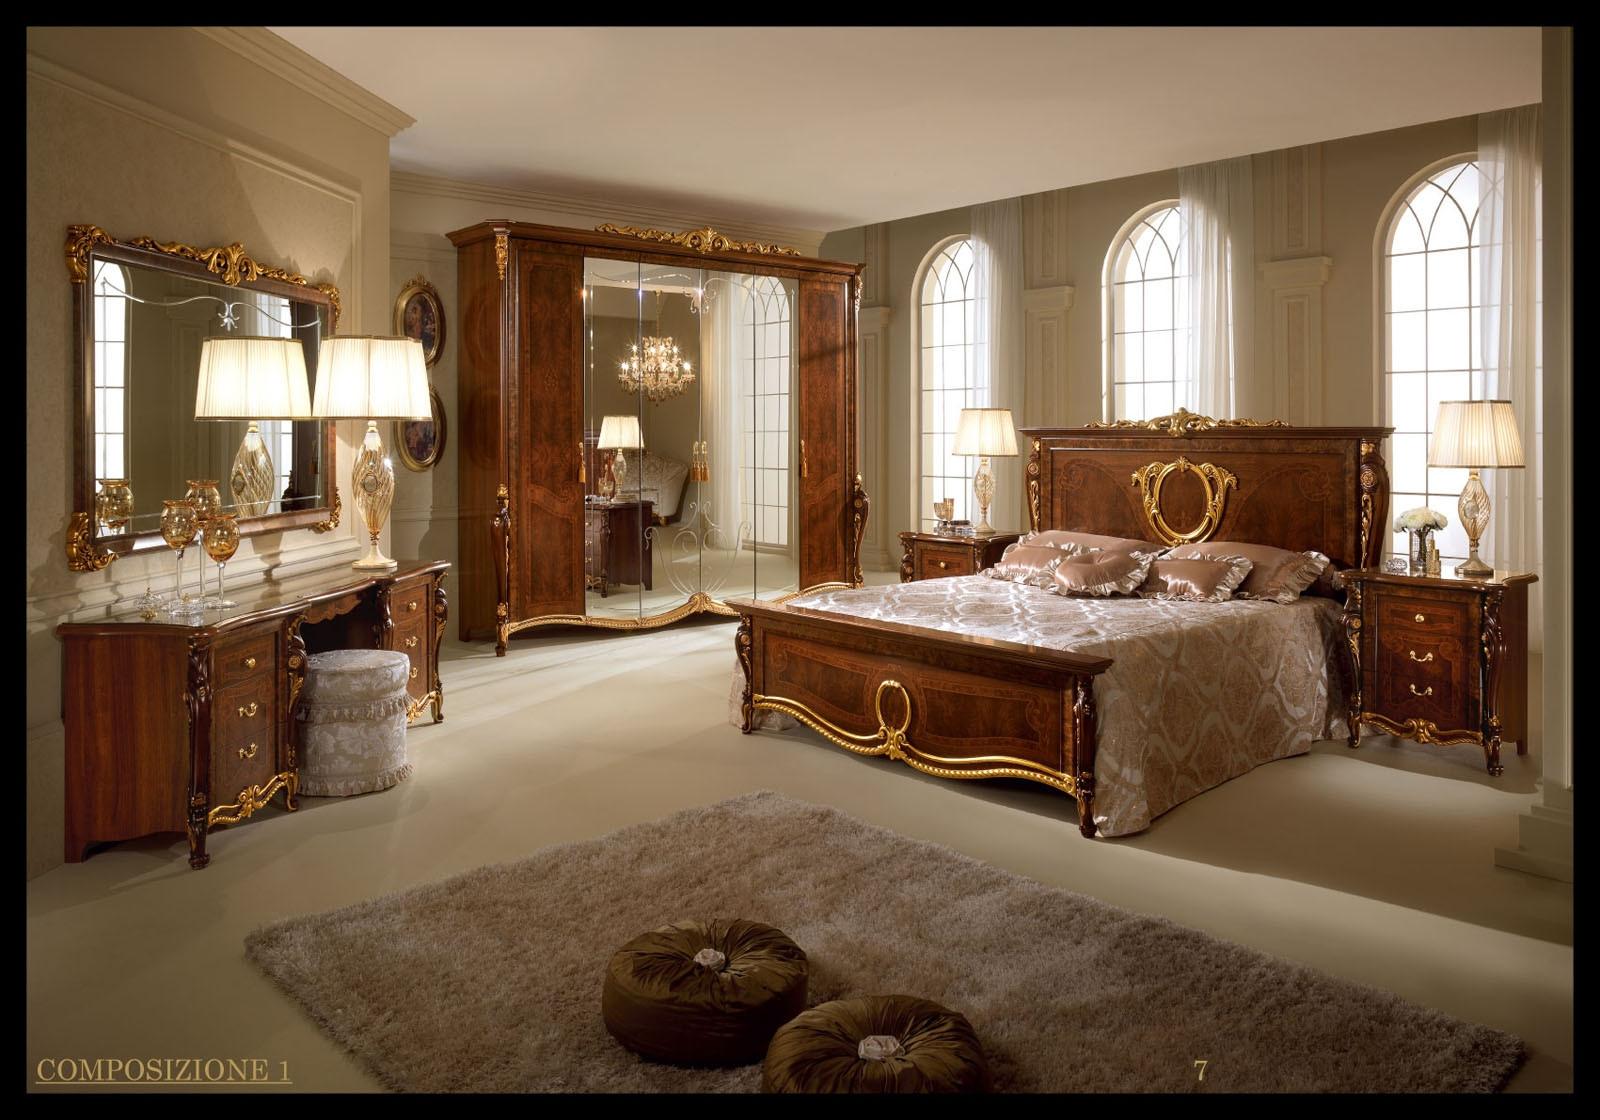 ... Bedroom Set In Walnut Finish Donatello Vanity Dresser And Pouf ...